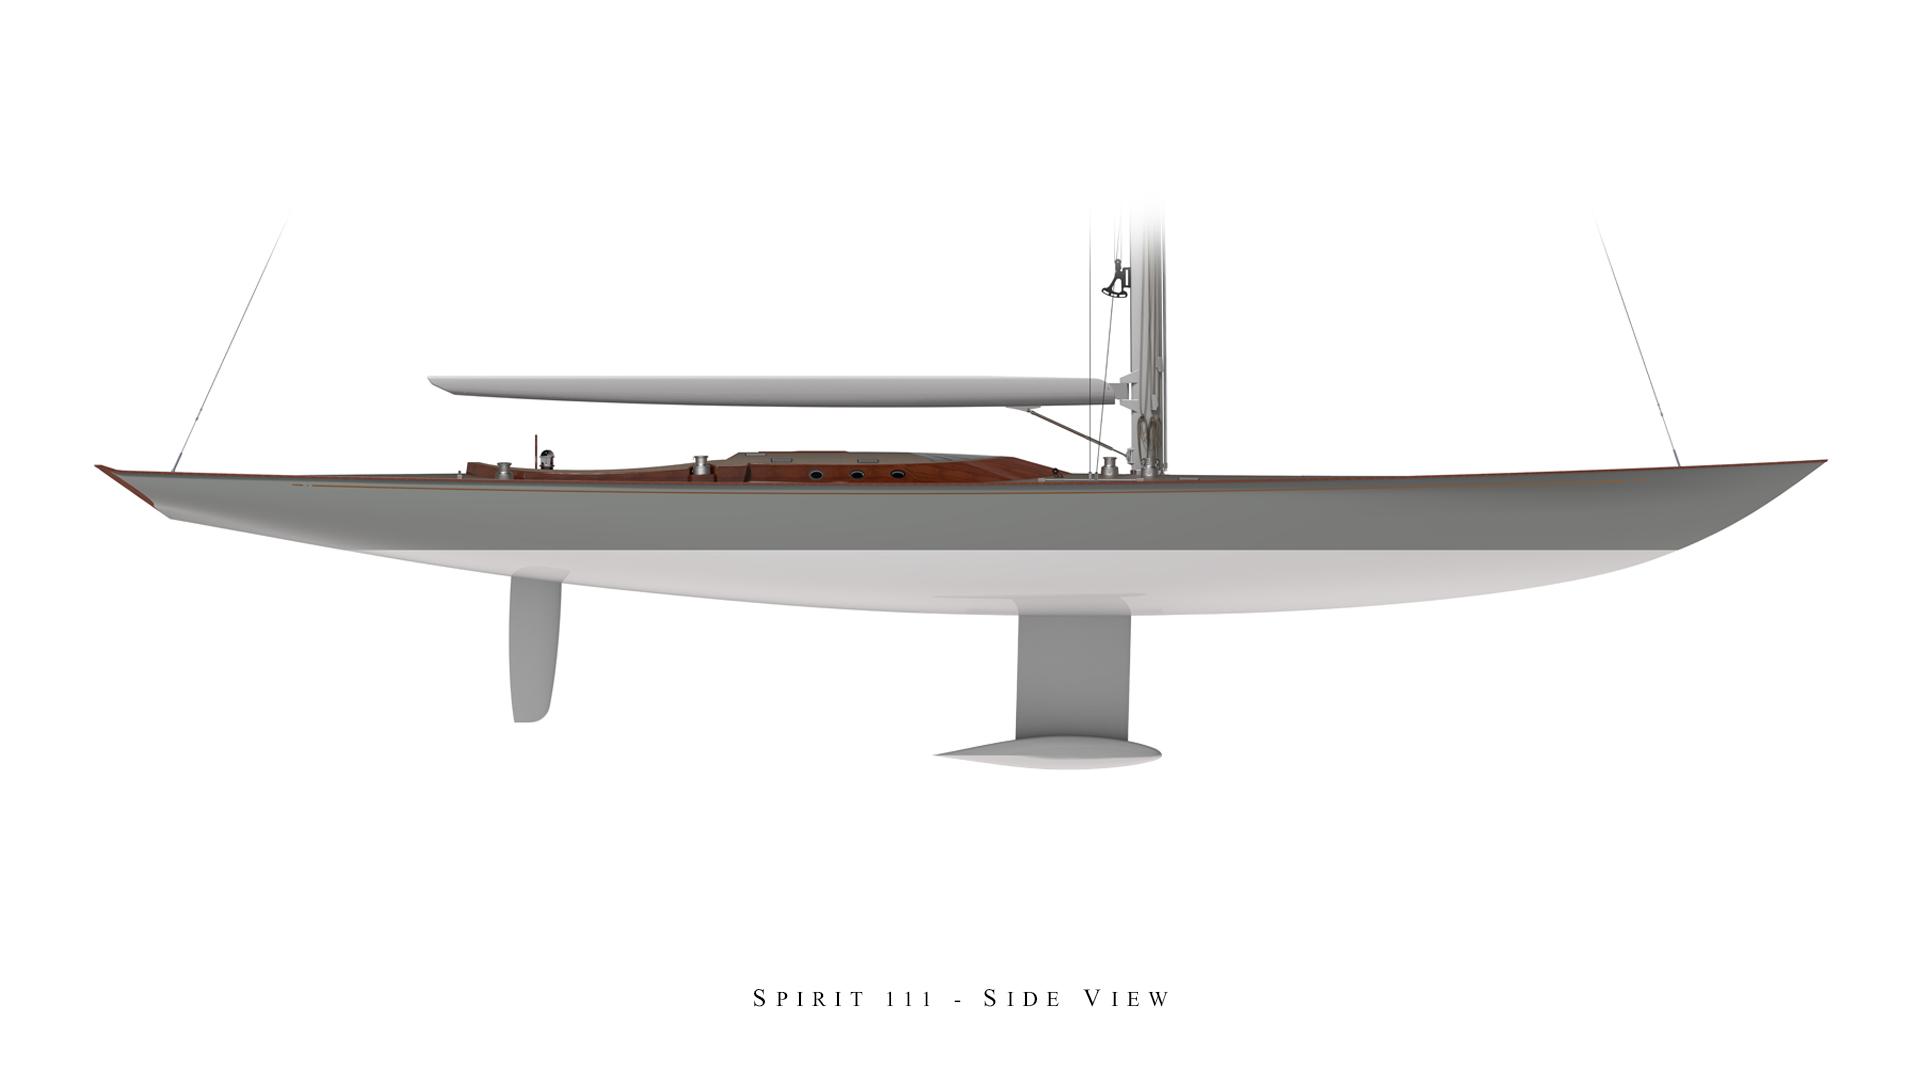 Spirit 111 - Side View